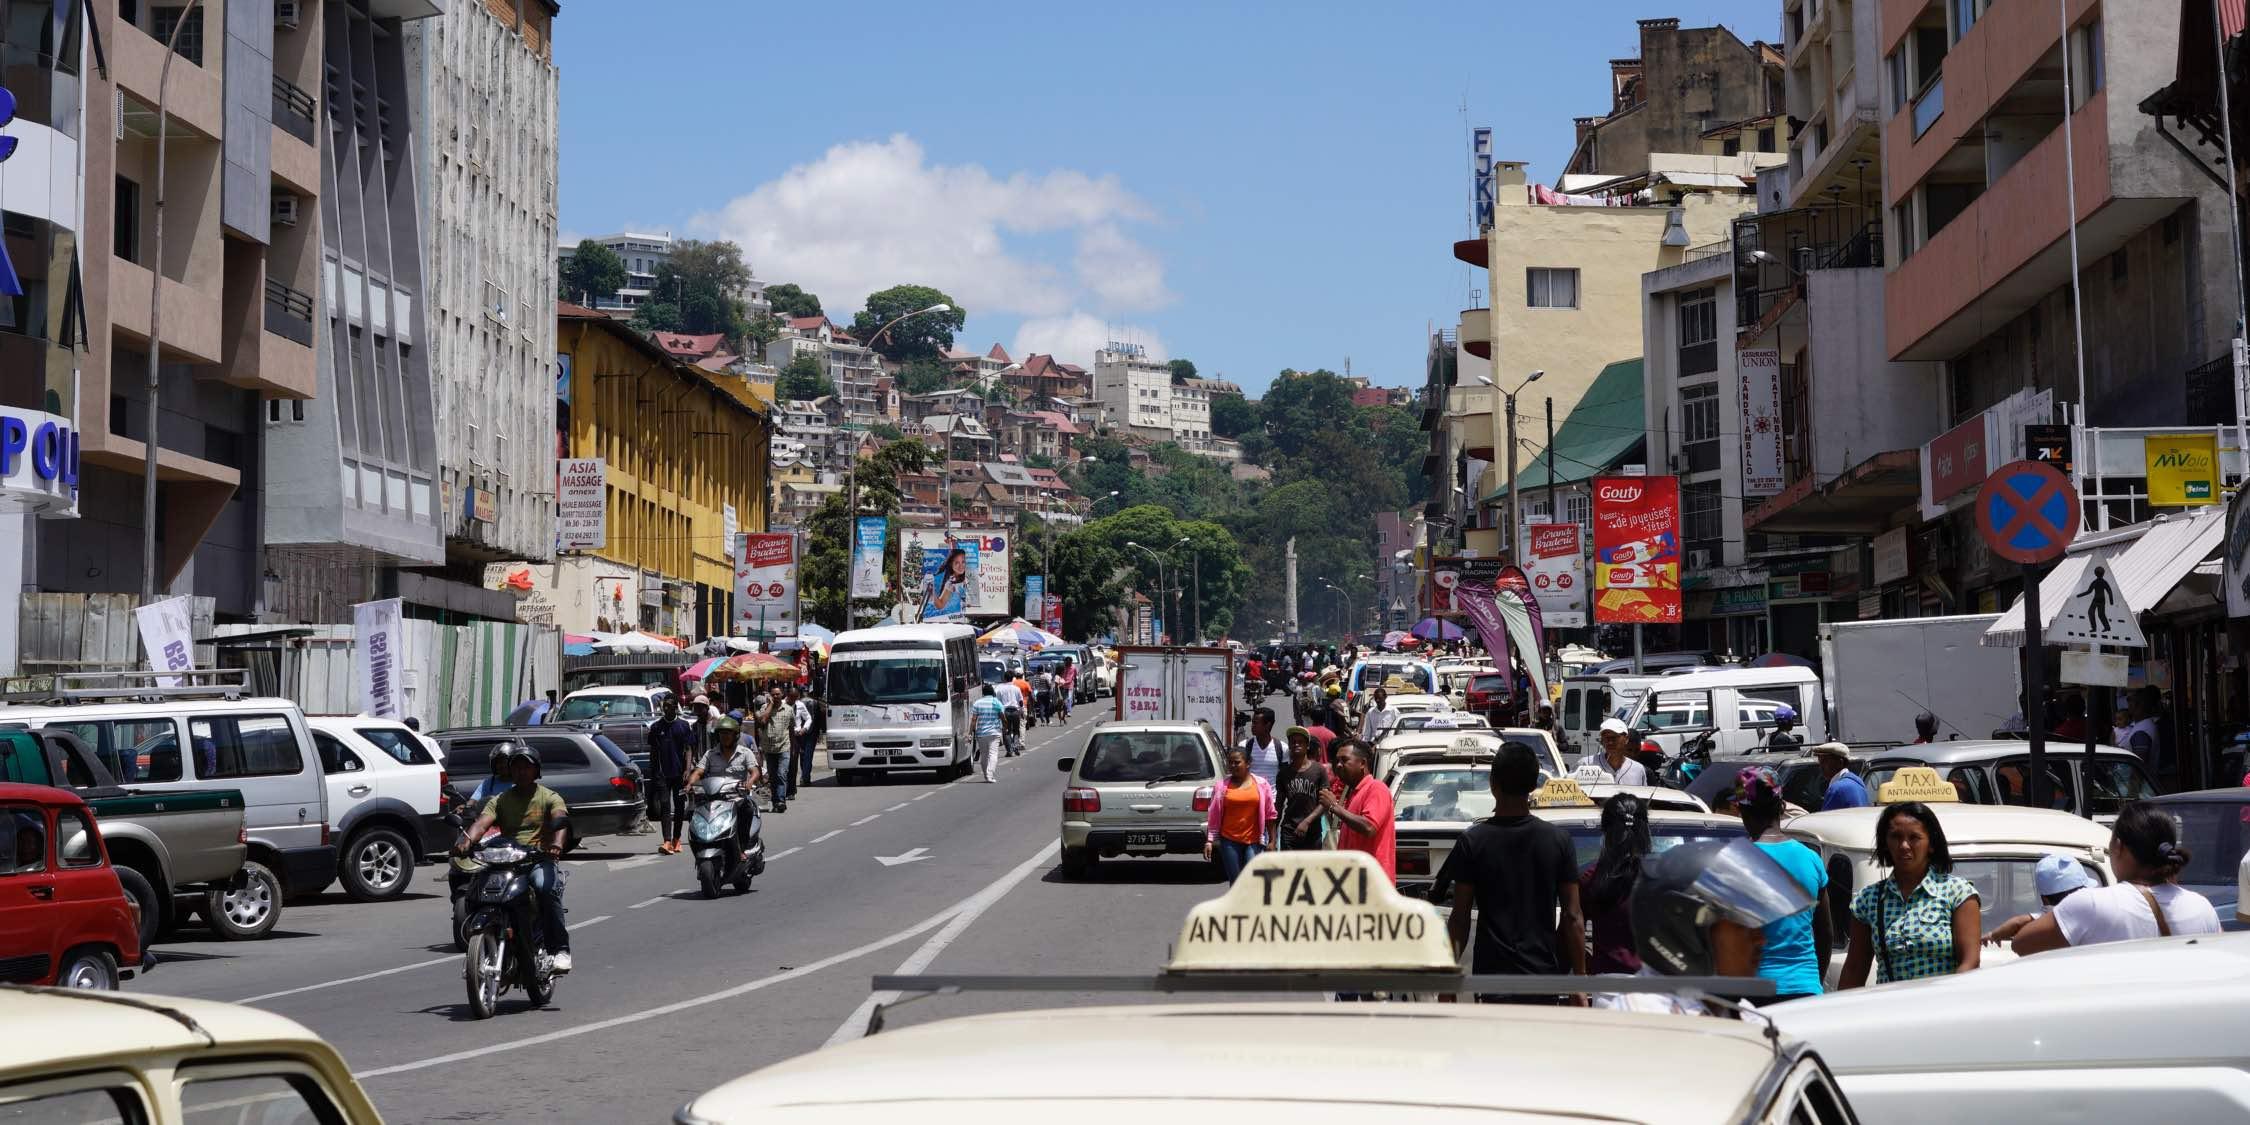 Antananarivo アンタナナリボ 安塔那那列佛